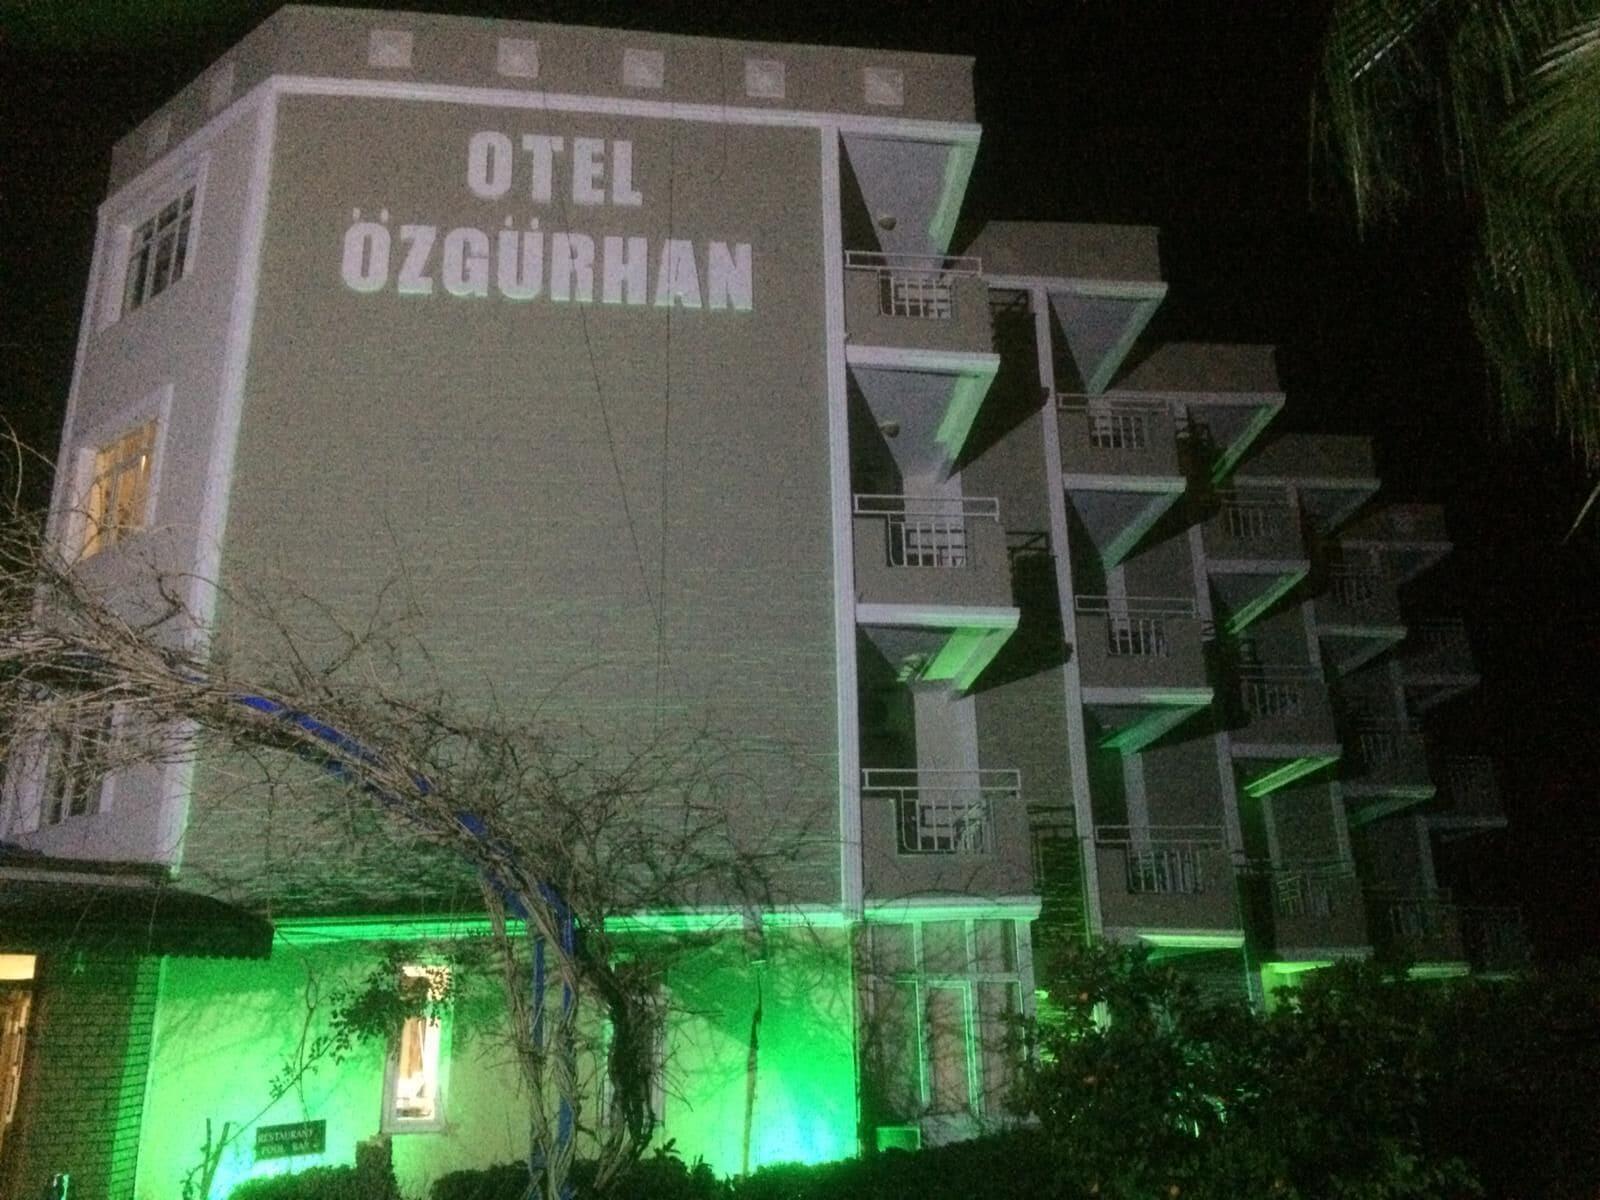 Side Ozgurhan